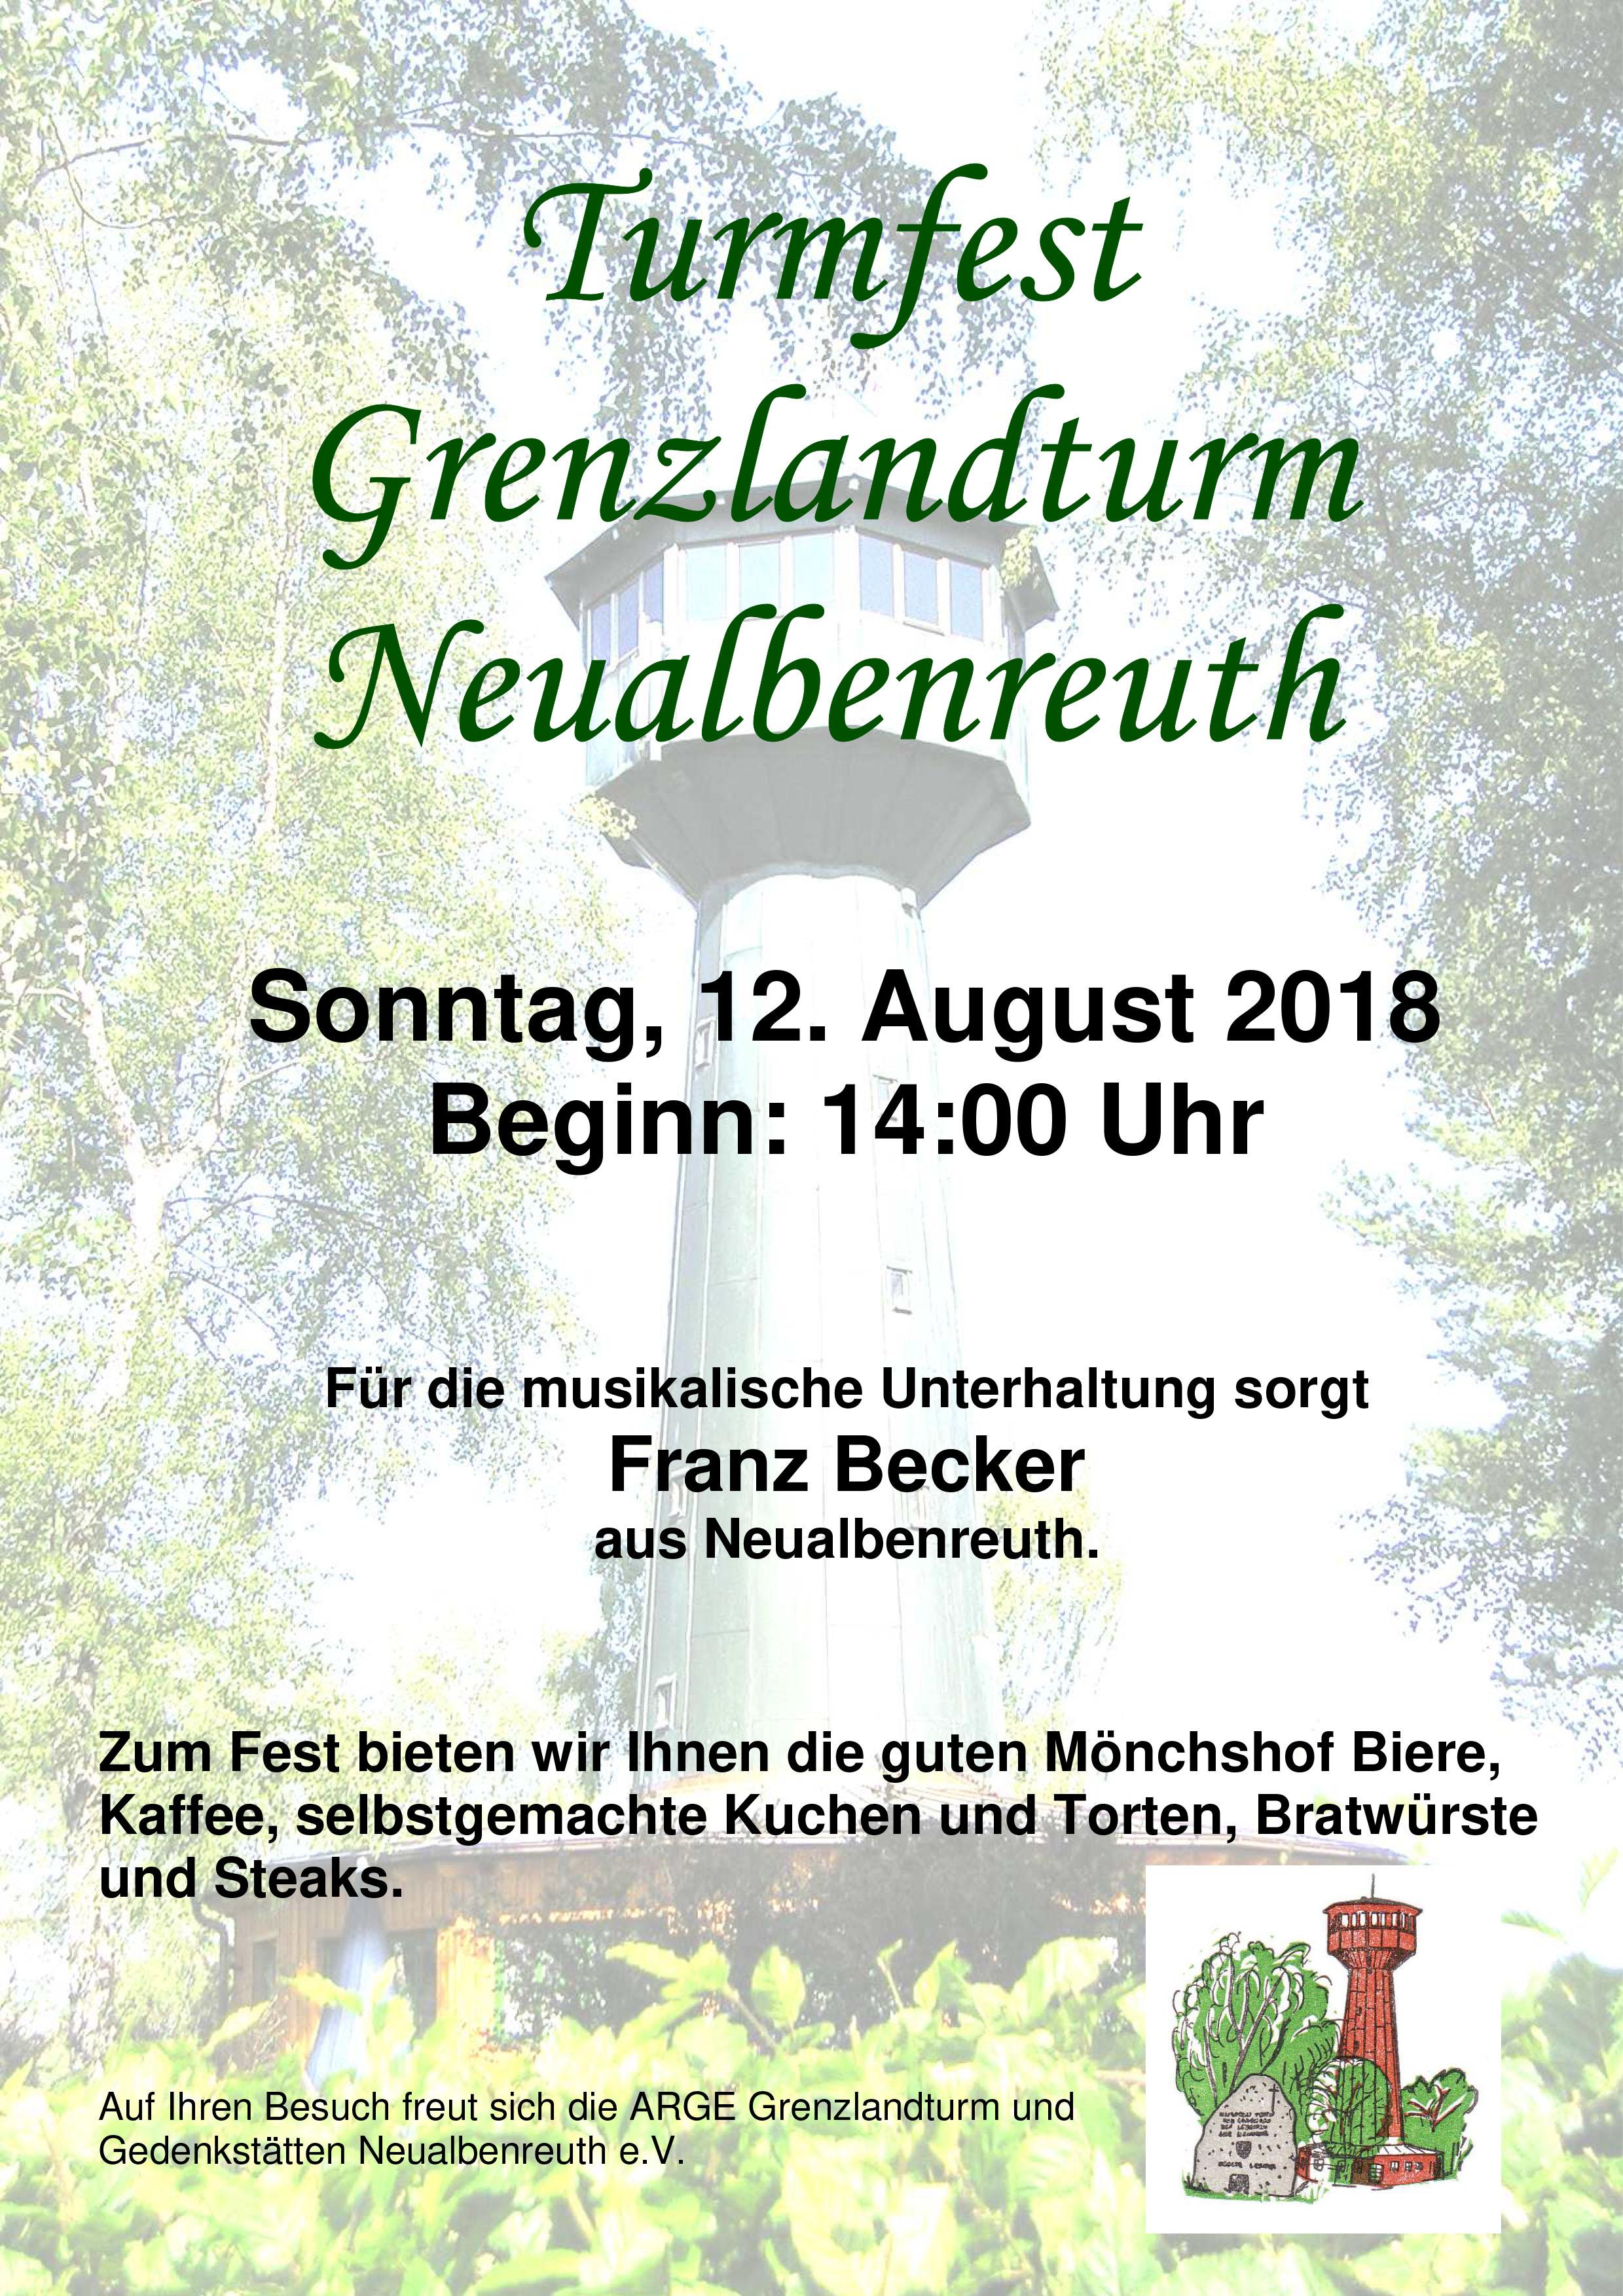 2018-08-12 Turmfest